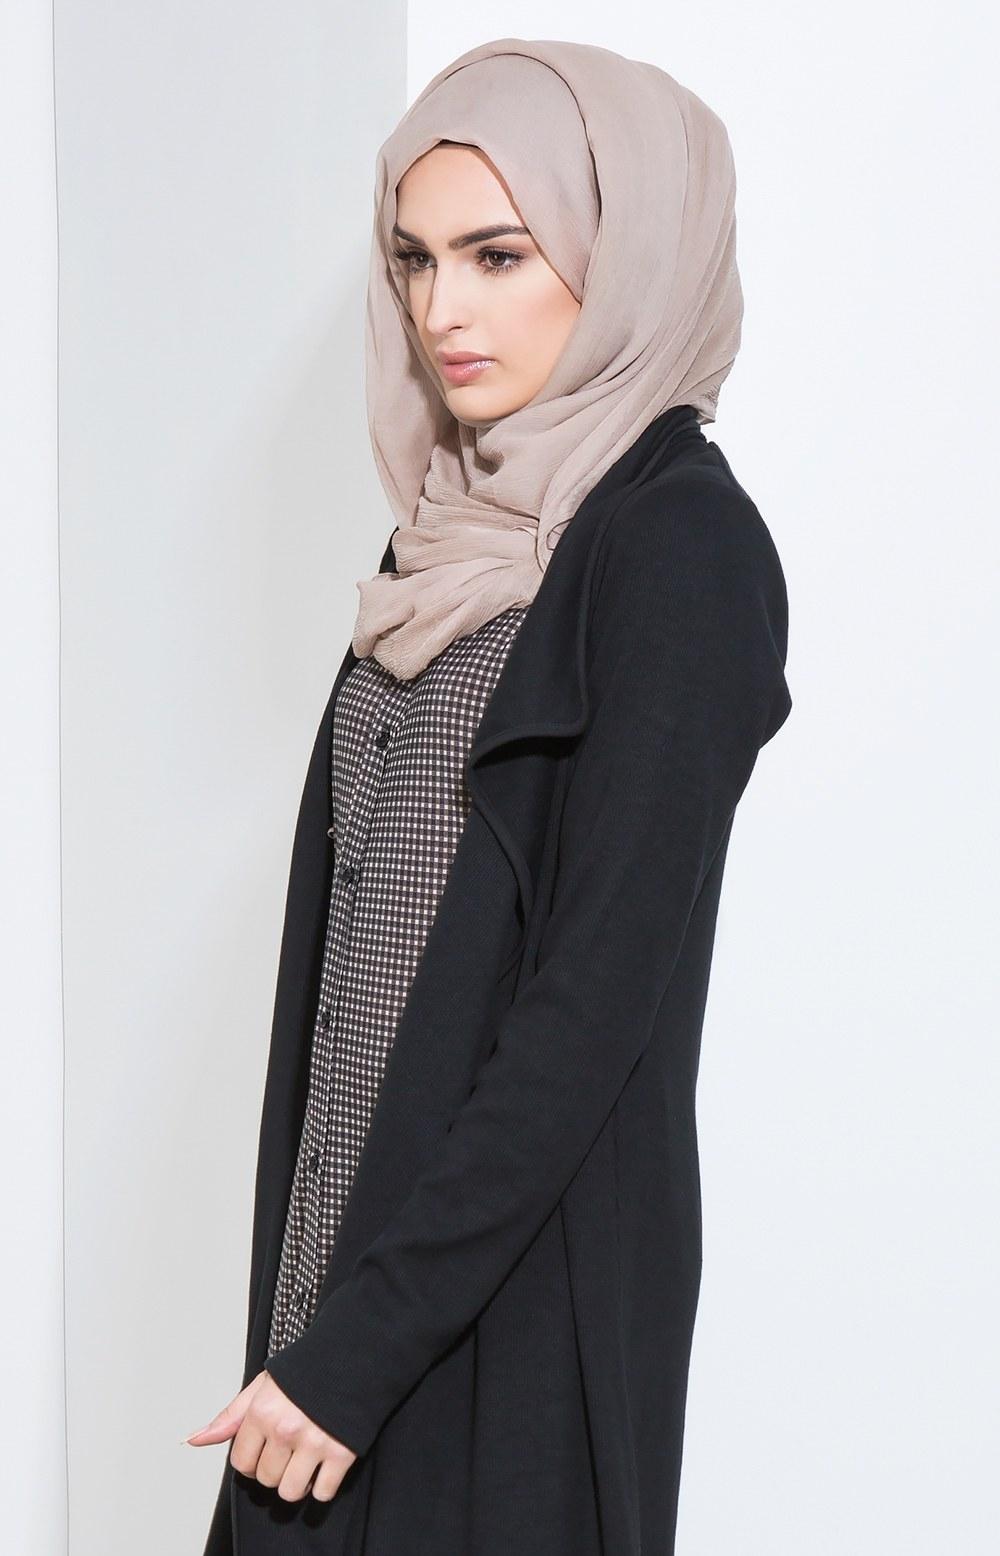 Ide Fashion Baju Lebaran 2018 Mndw 25 Trend Model Baju Muslim Lebaran 2018 Simple & Modis